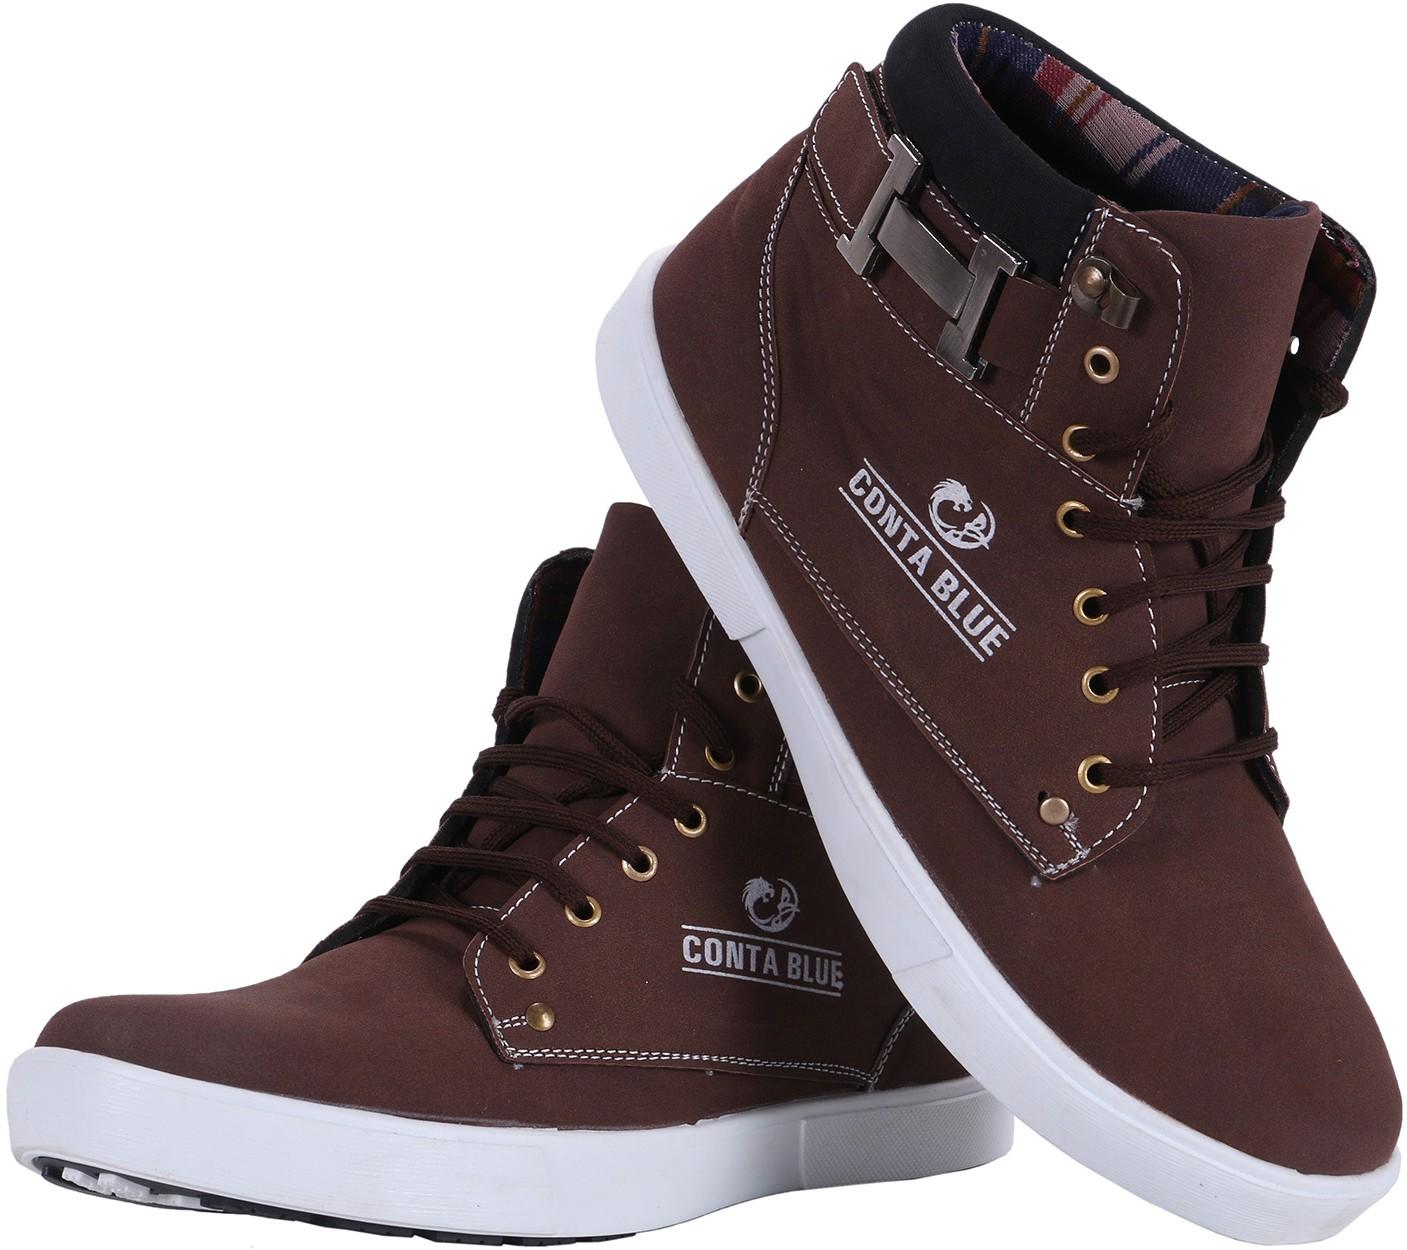 Contablue Men'S 'H'Unk Sneakers